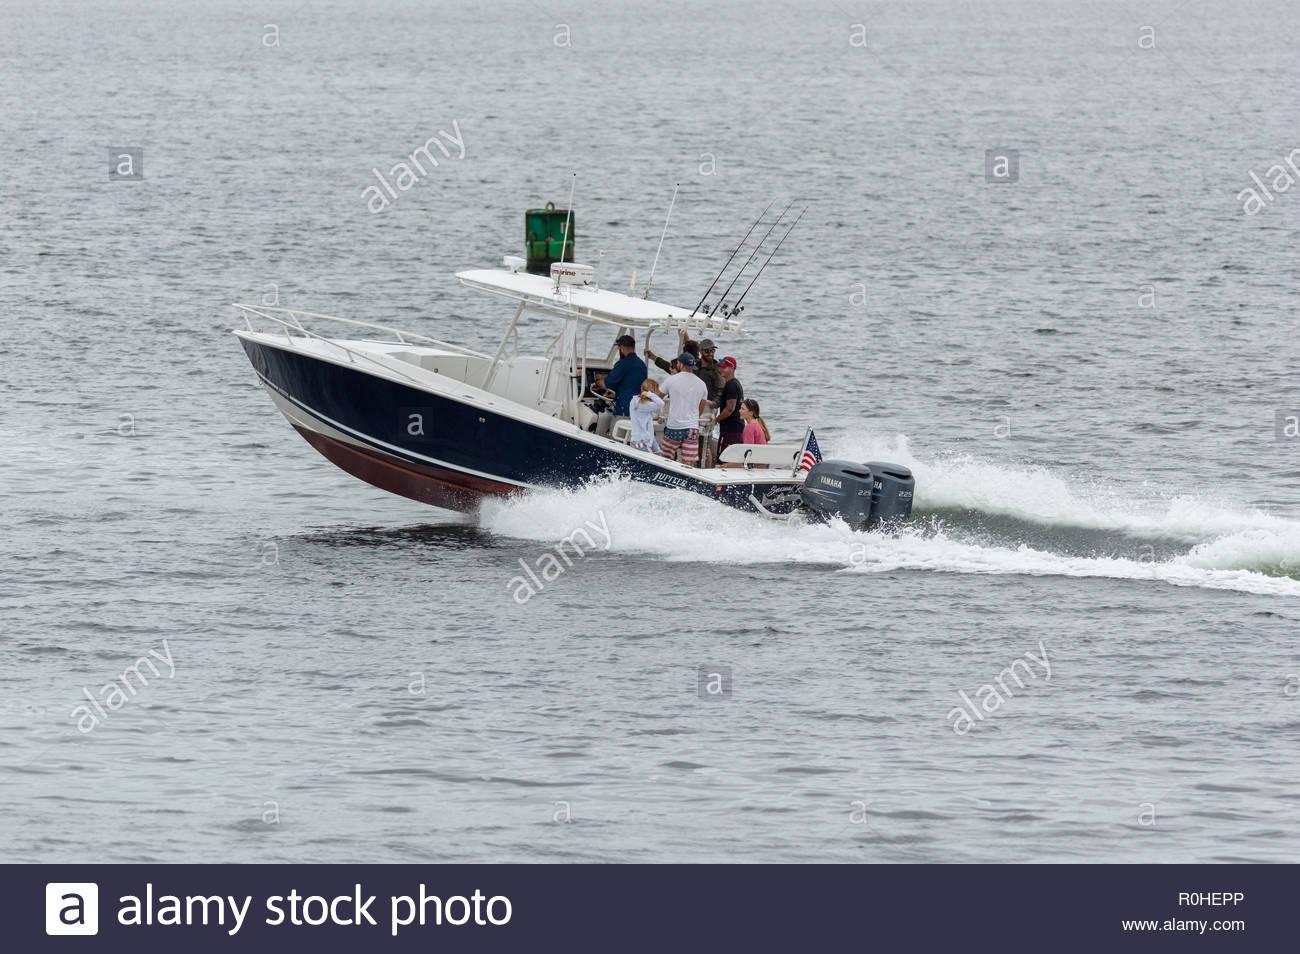 New Bedford, Massachusetts, USA - September 3, 2018: Recreational fishing boat cruising toward Buzzards Bay from New Bedford - Stock Image